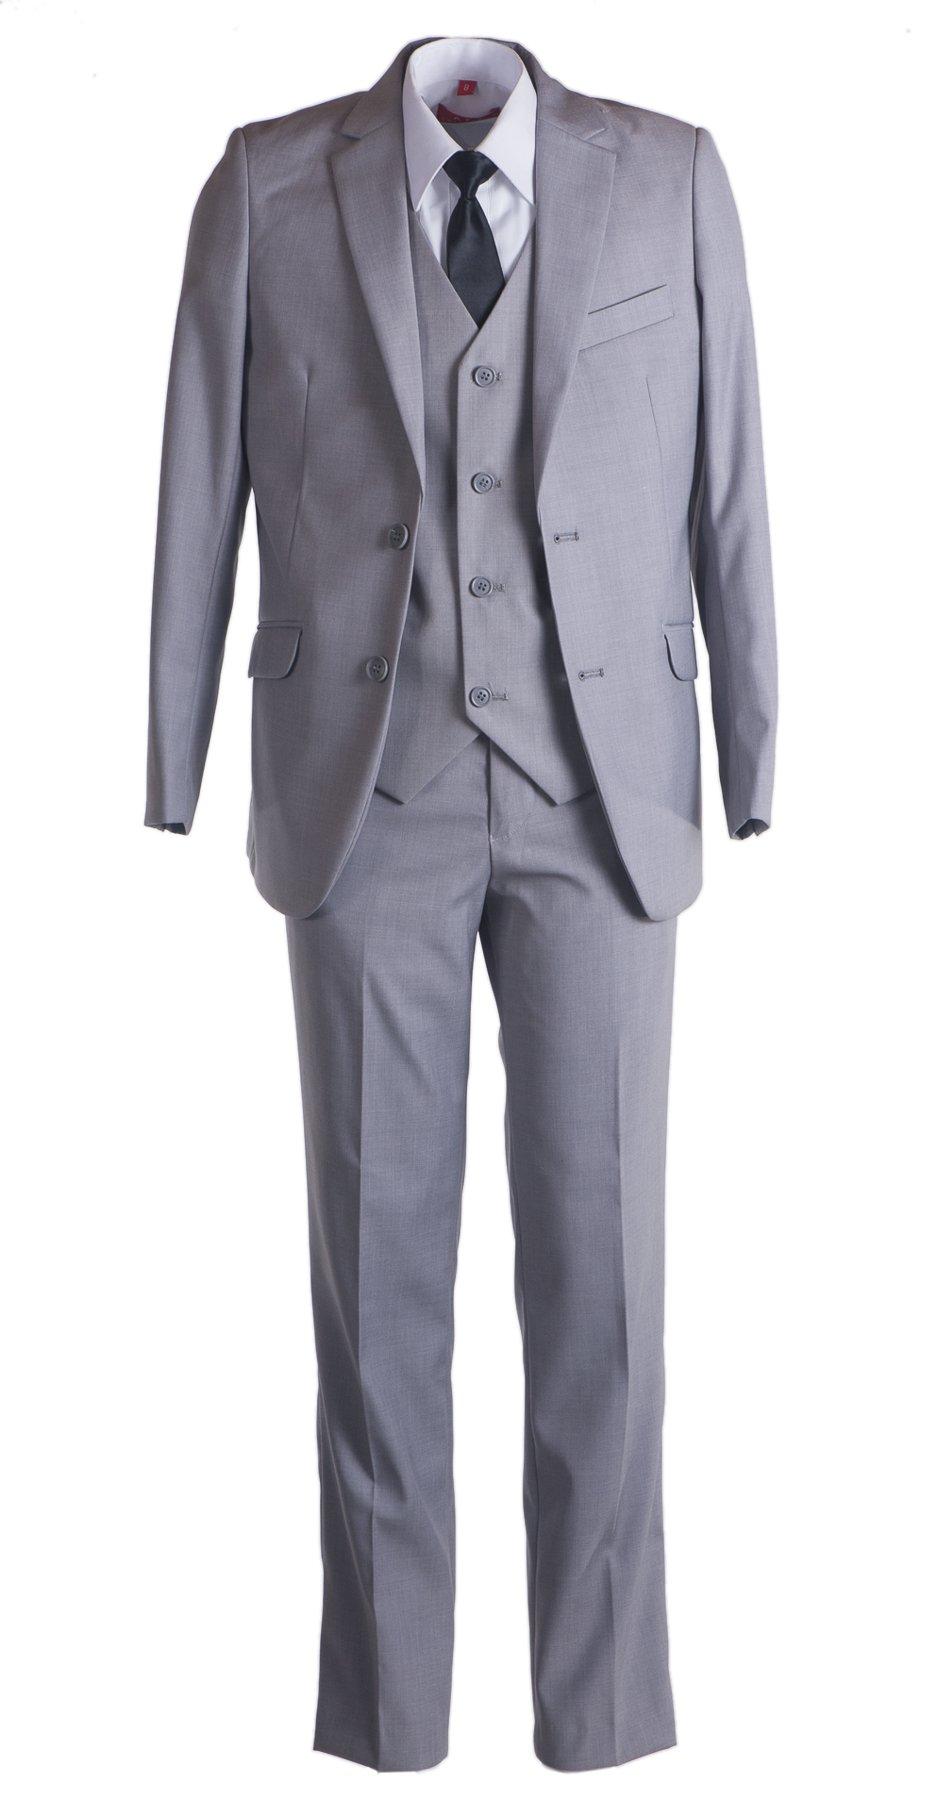 Boys Slim Fit Suit Light Grey with Black Dress Tie (6)